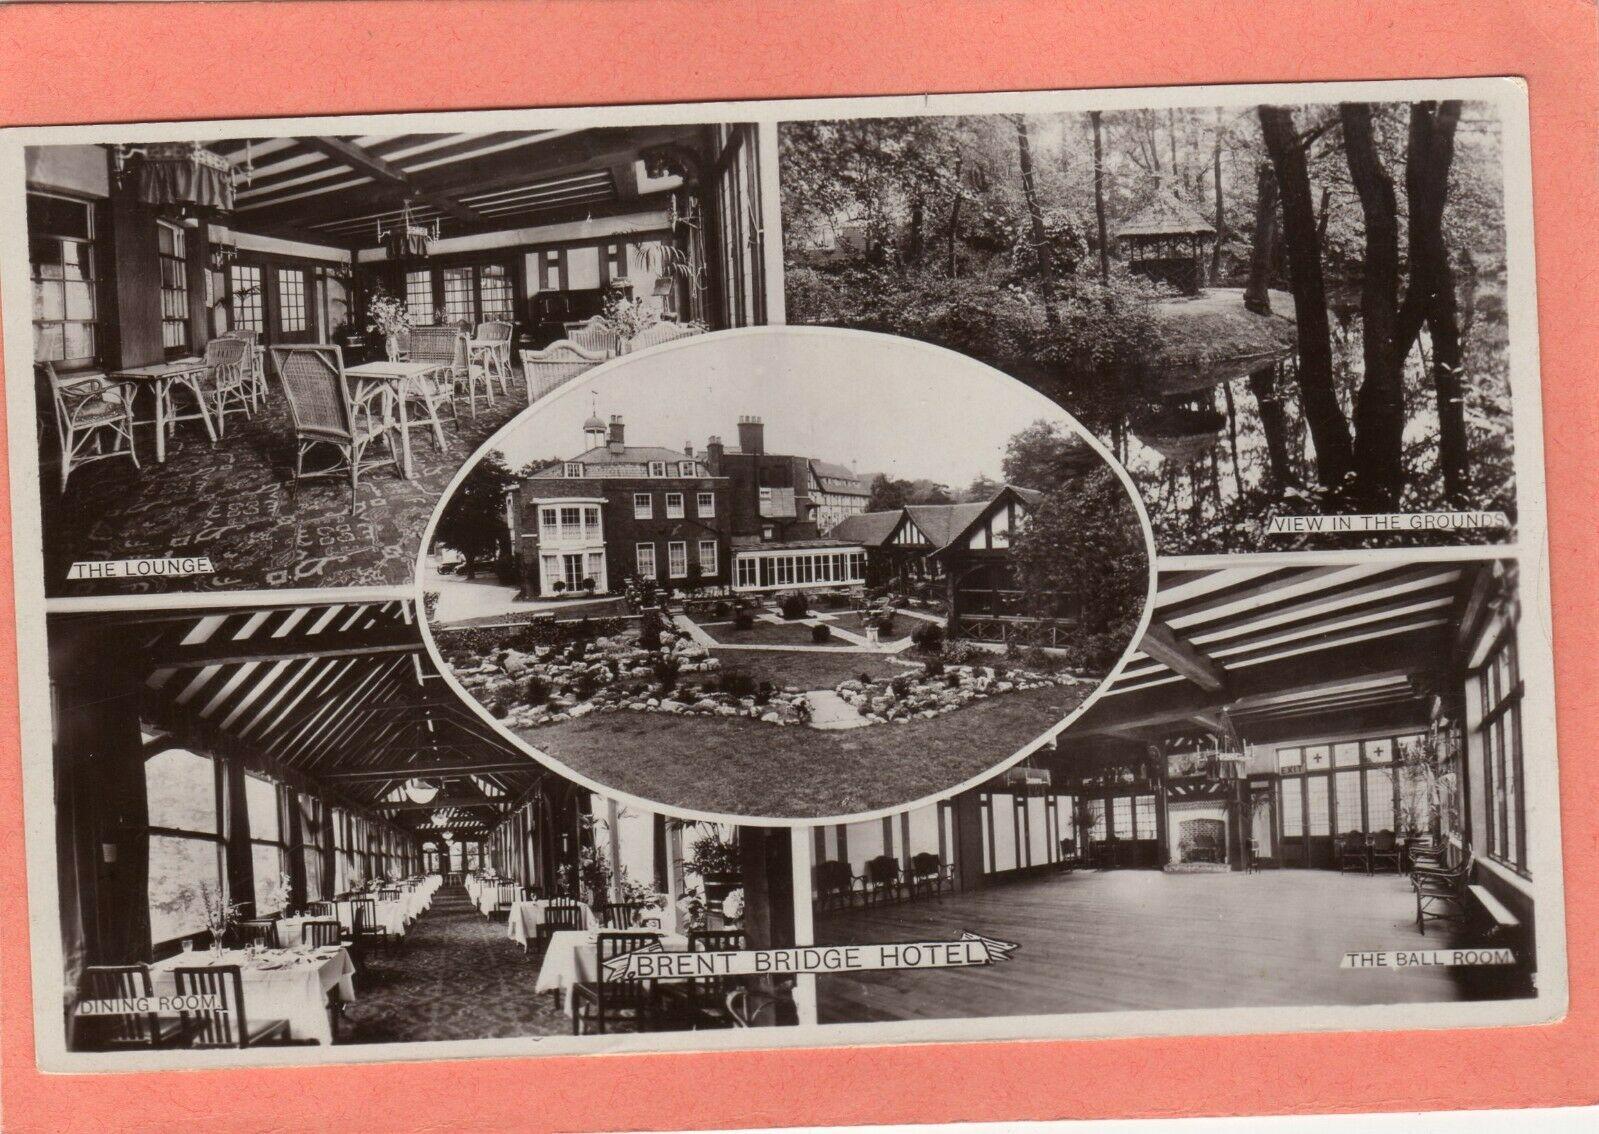 Brent-Bridge-Hotel-Multi-View-Hendon-London-Middlesex